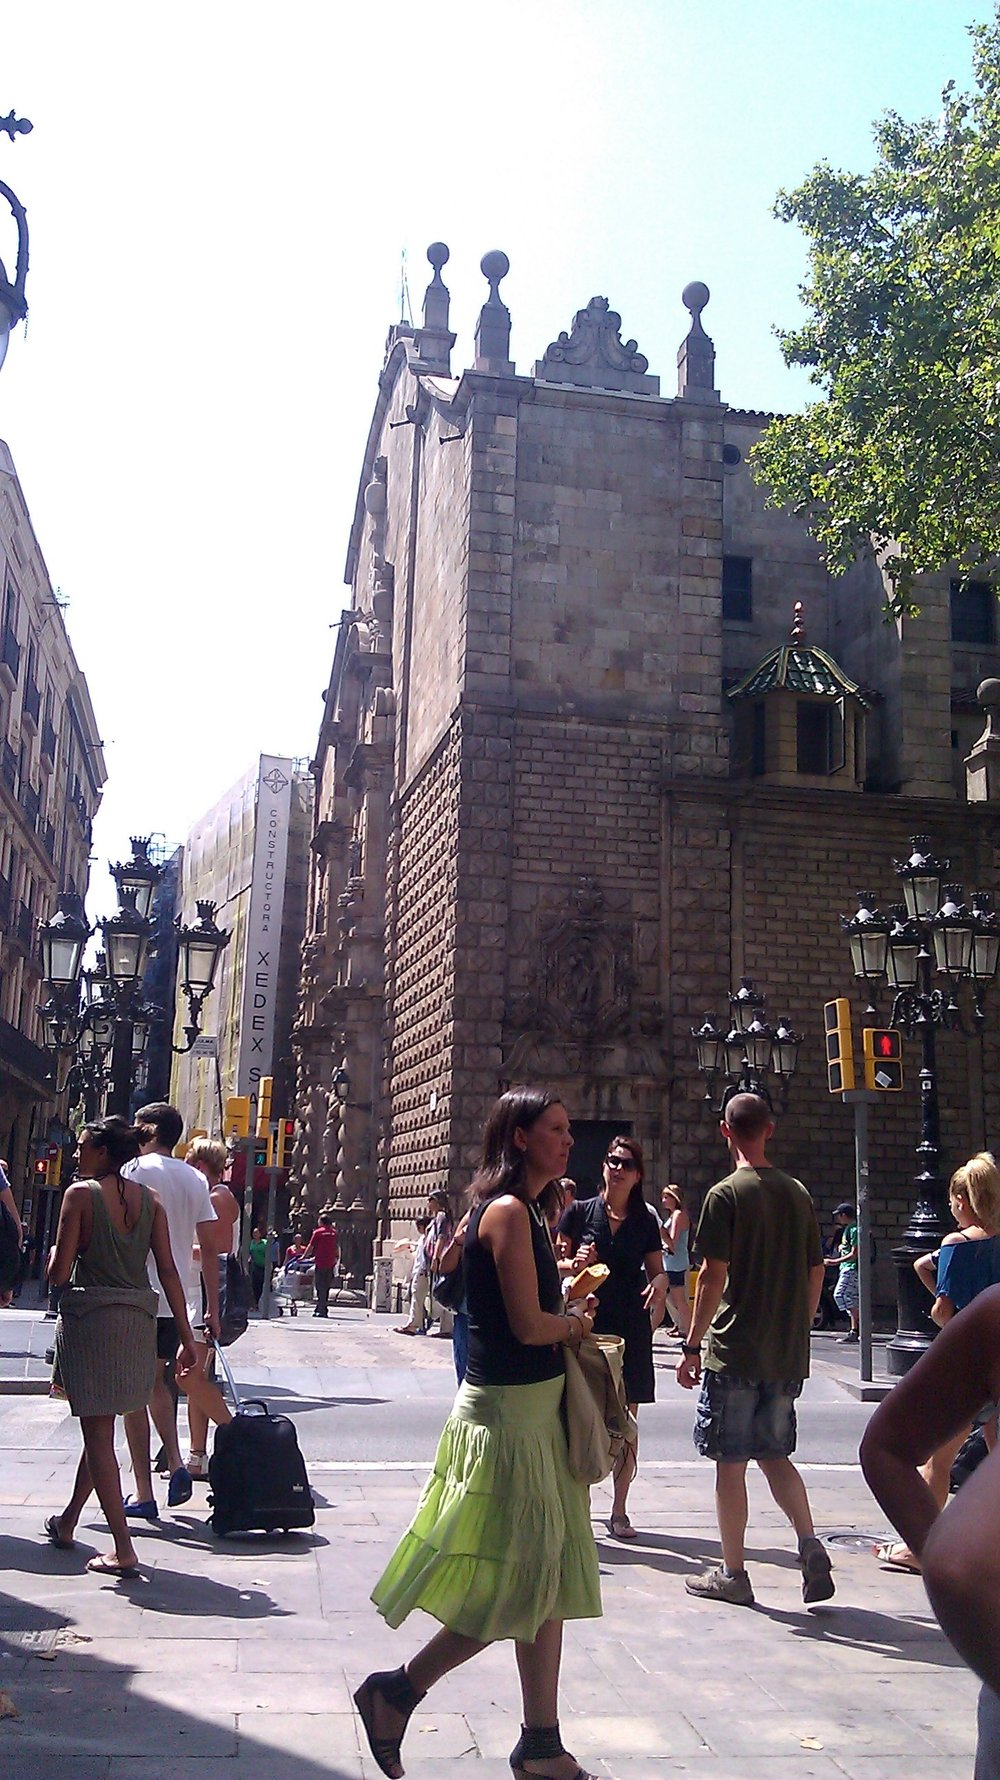 Barcelona-Old-City.jpg